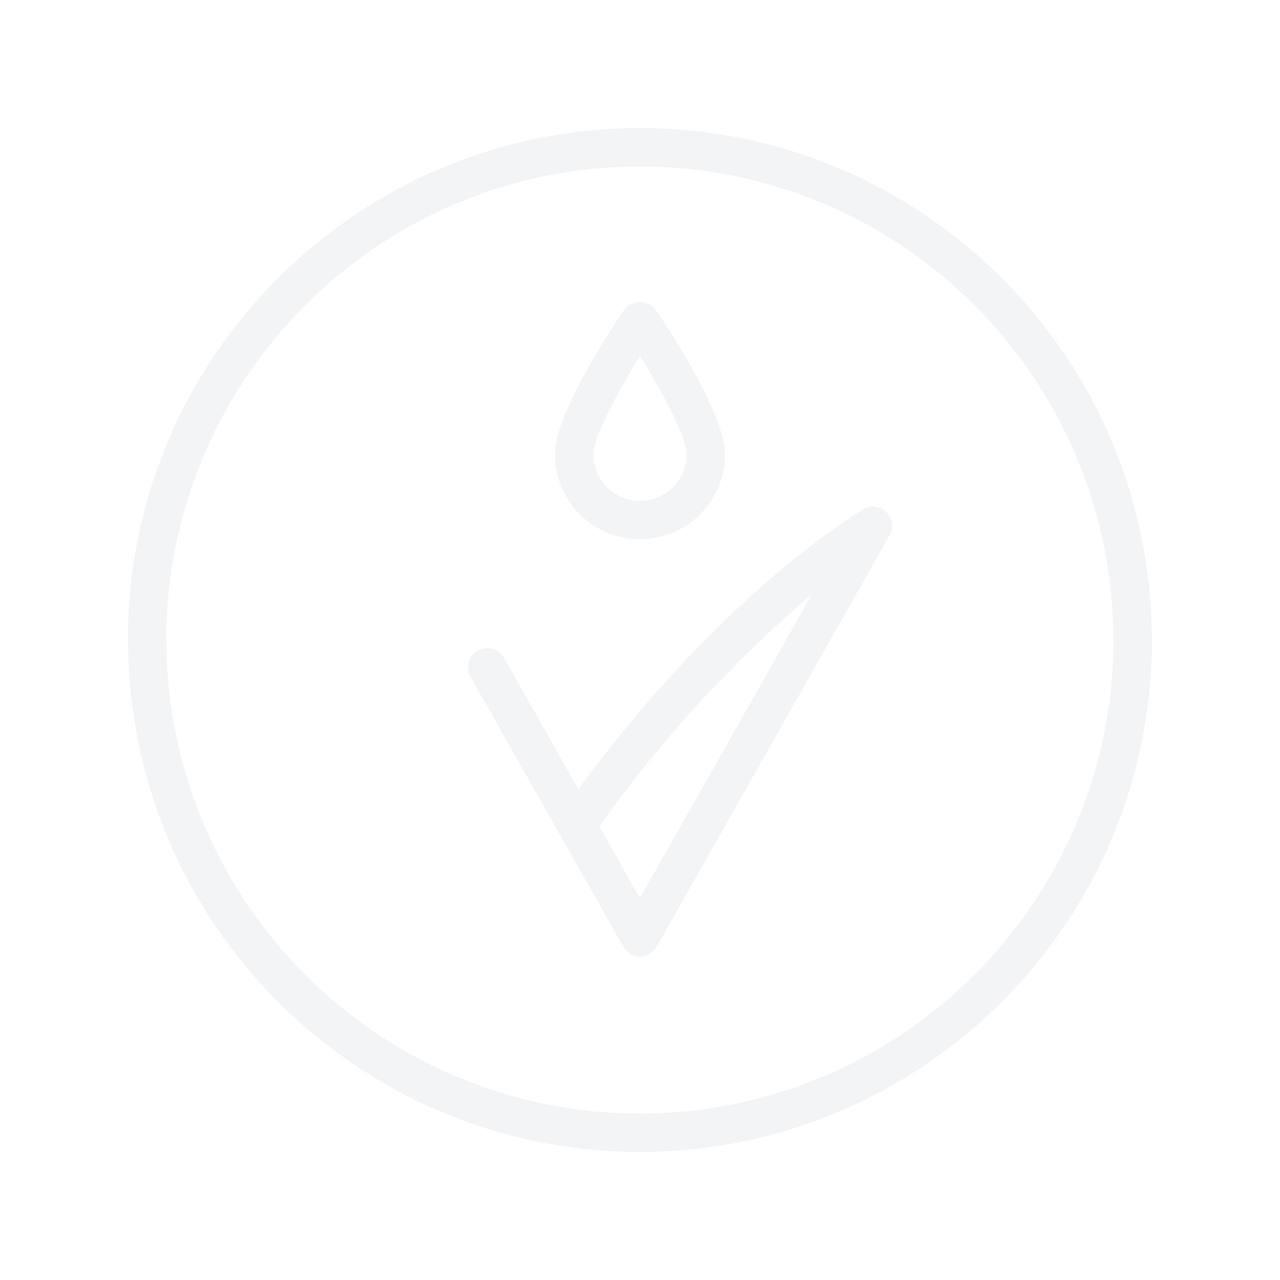 Karl Lagerfeld For Him Eau De Toilette